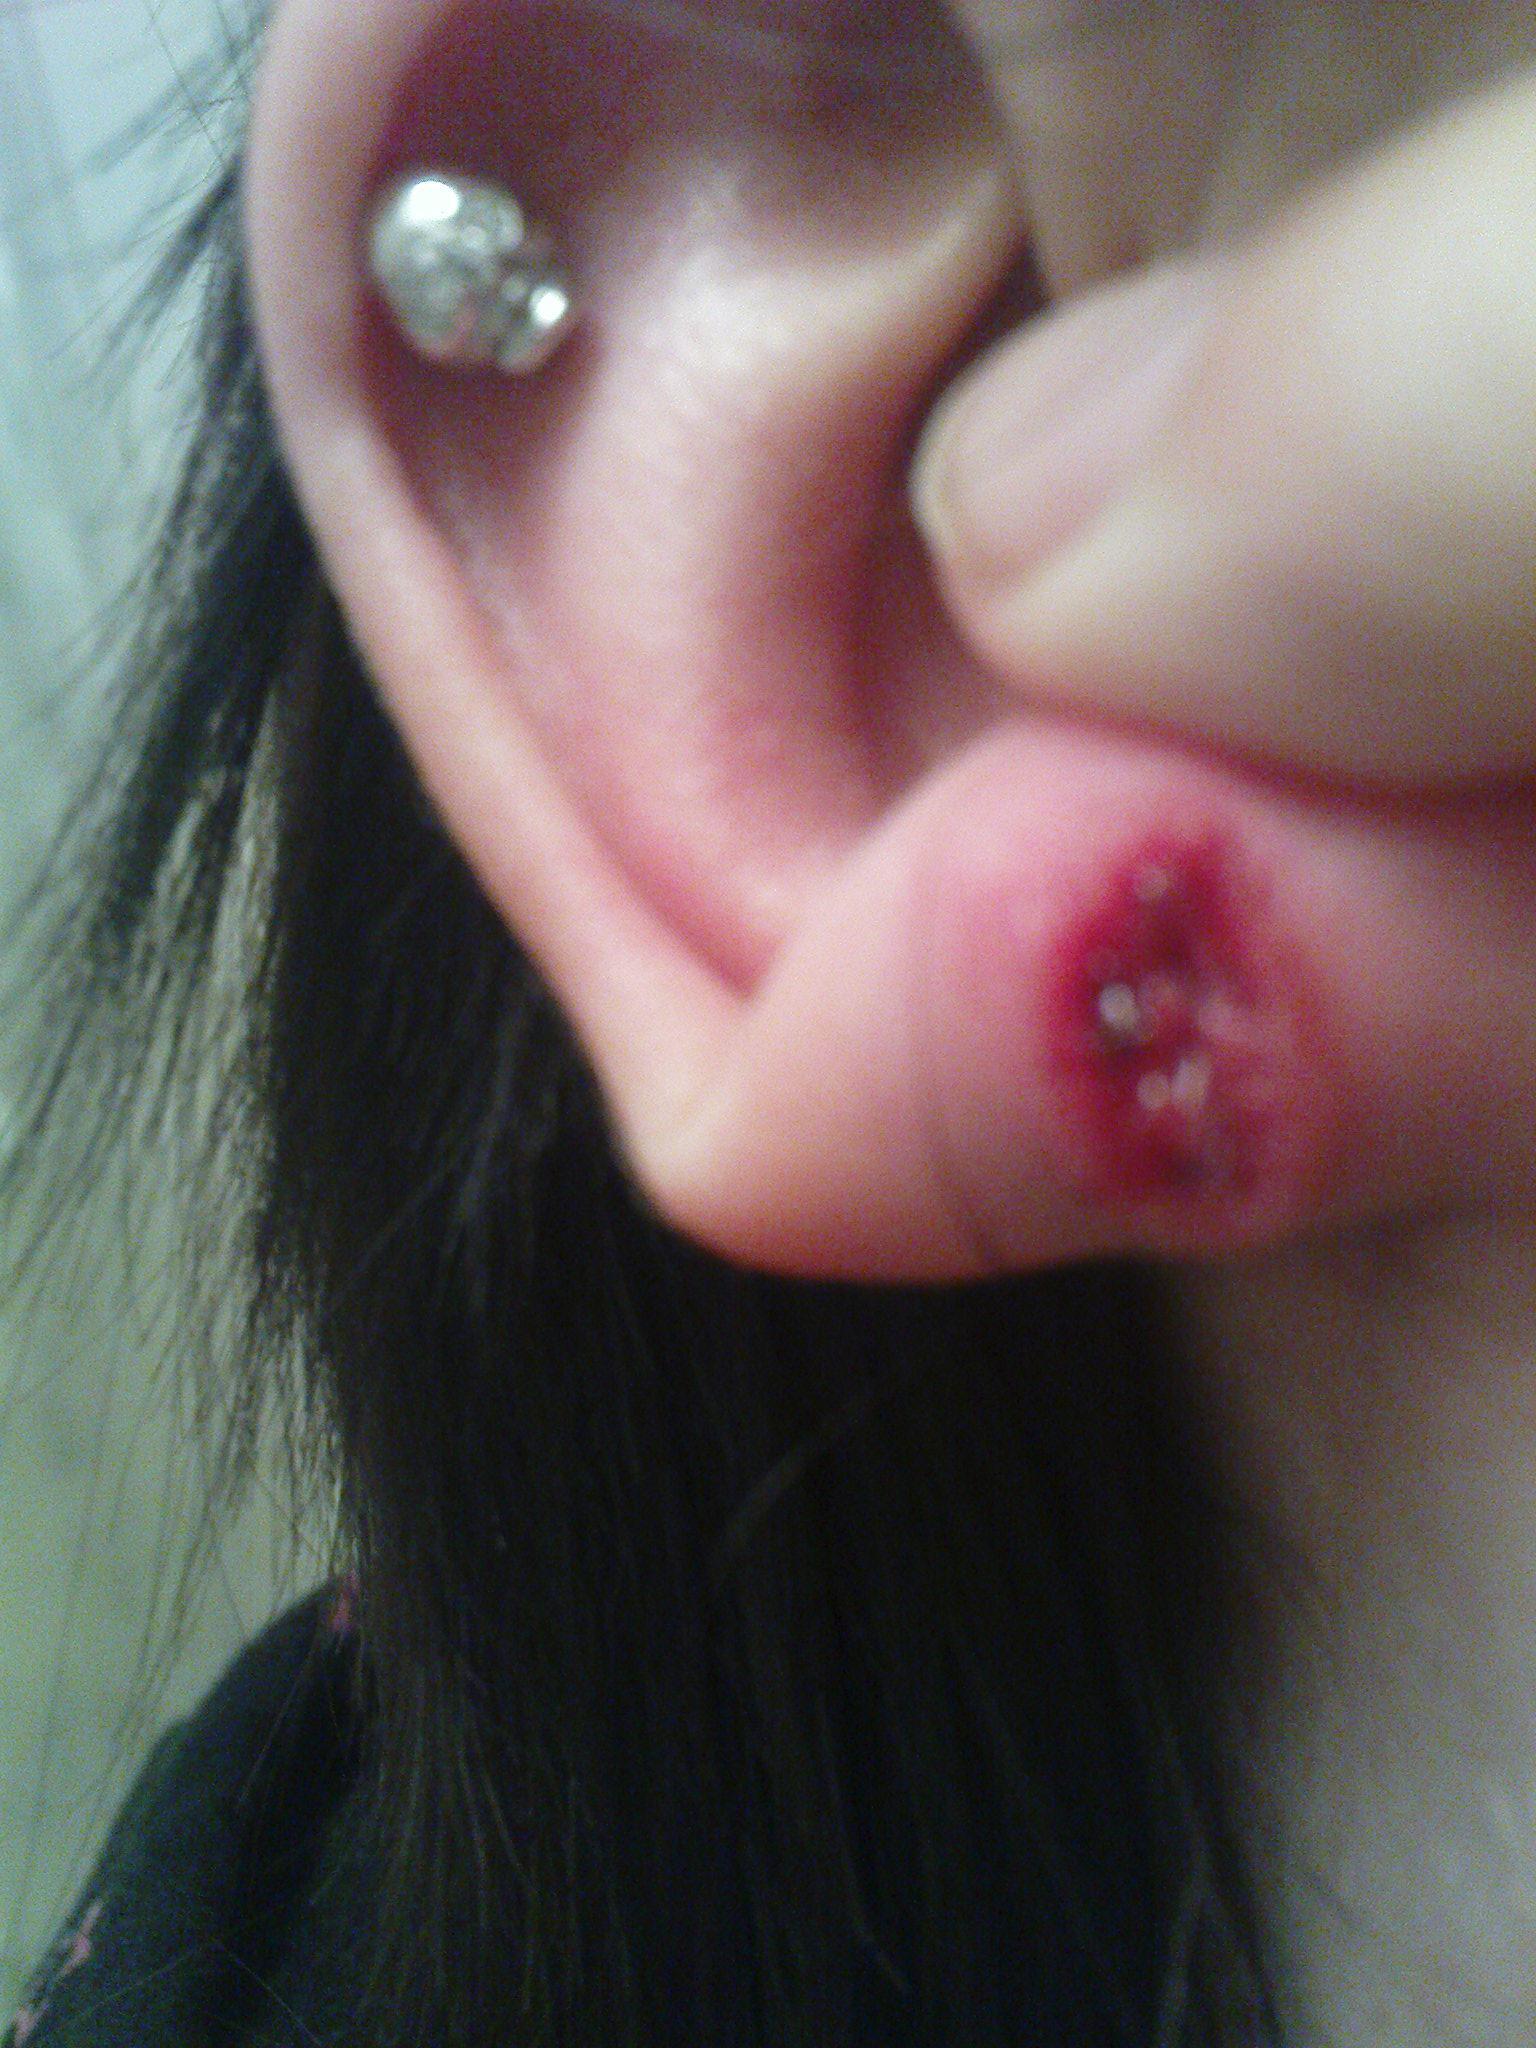 infektion i öronhål